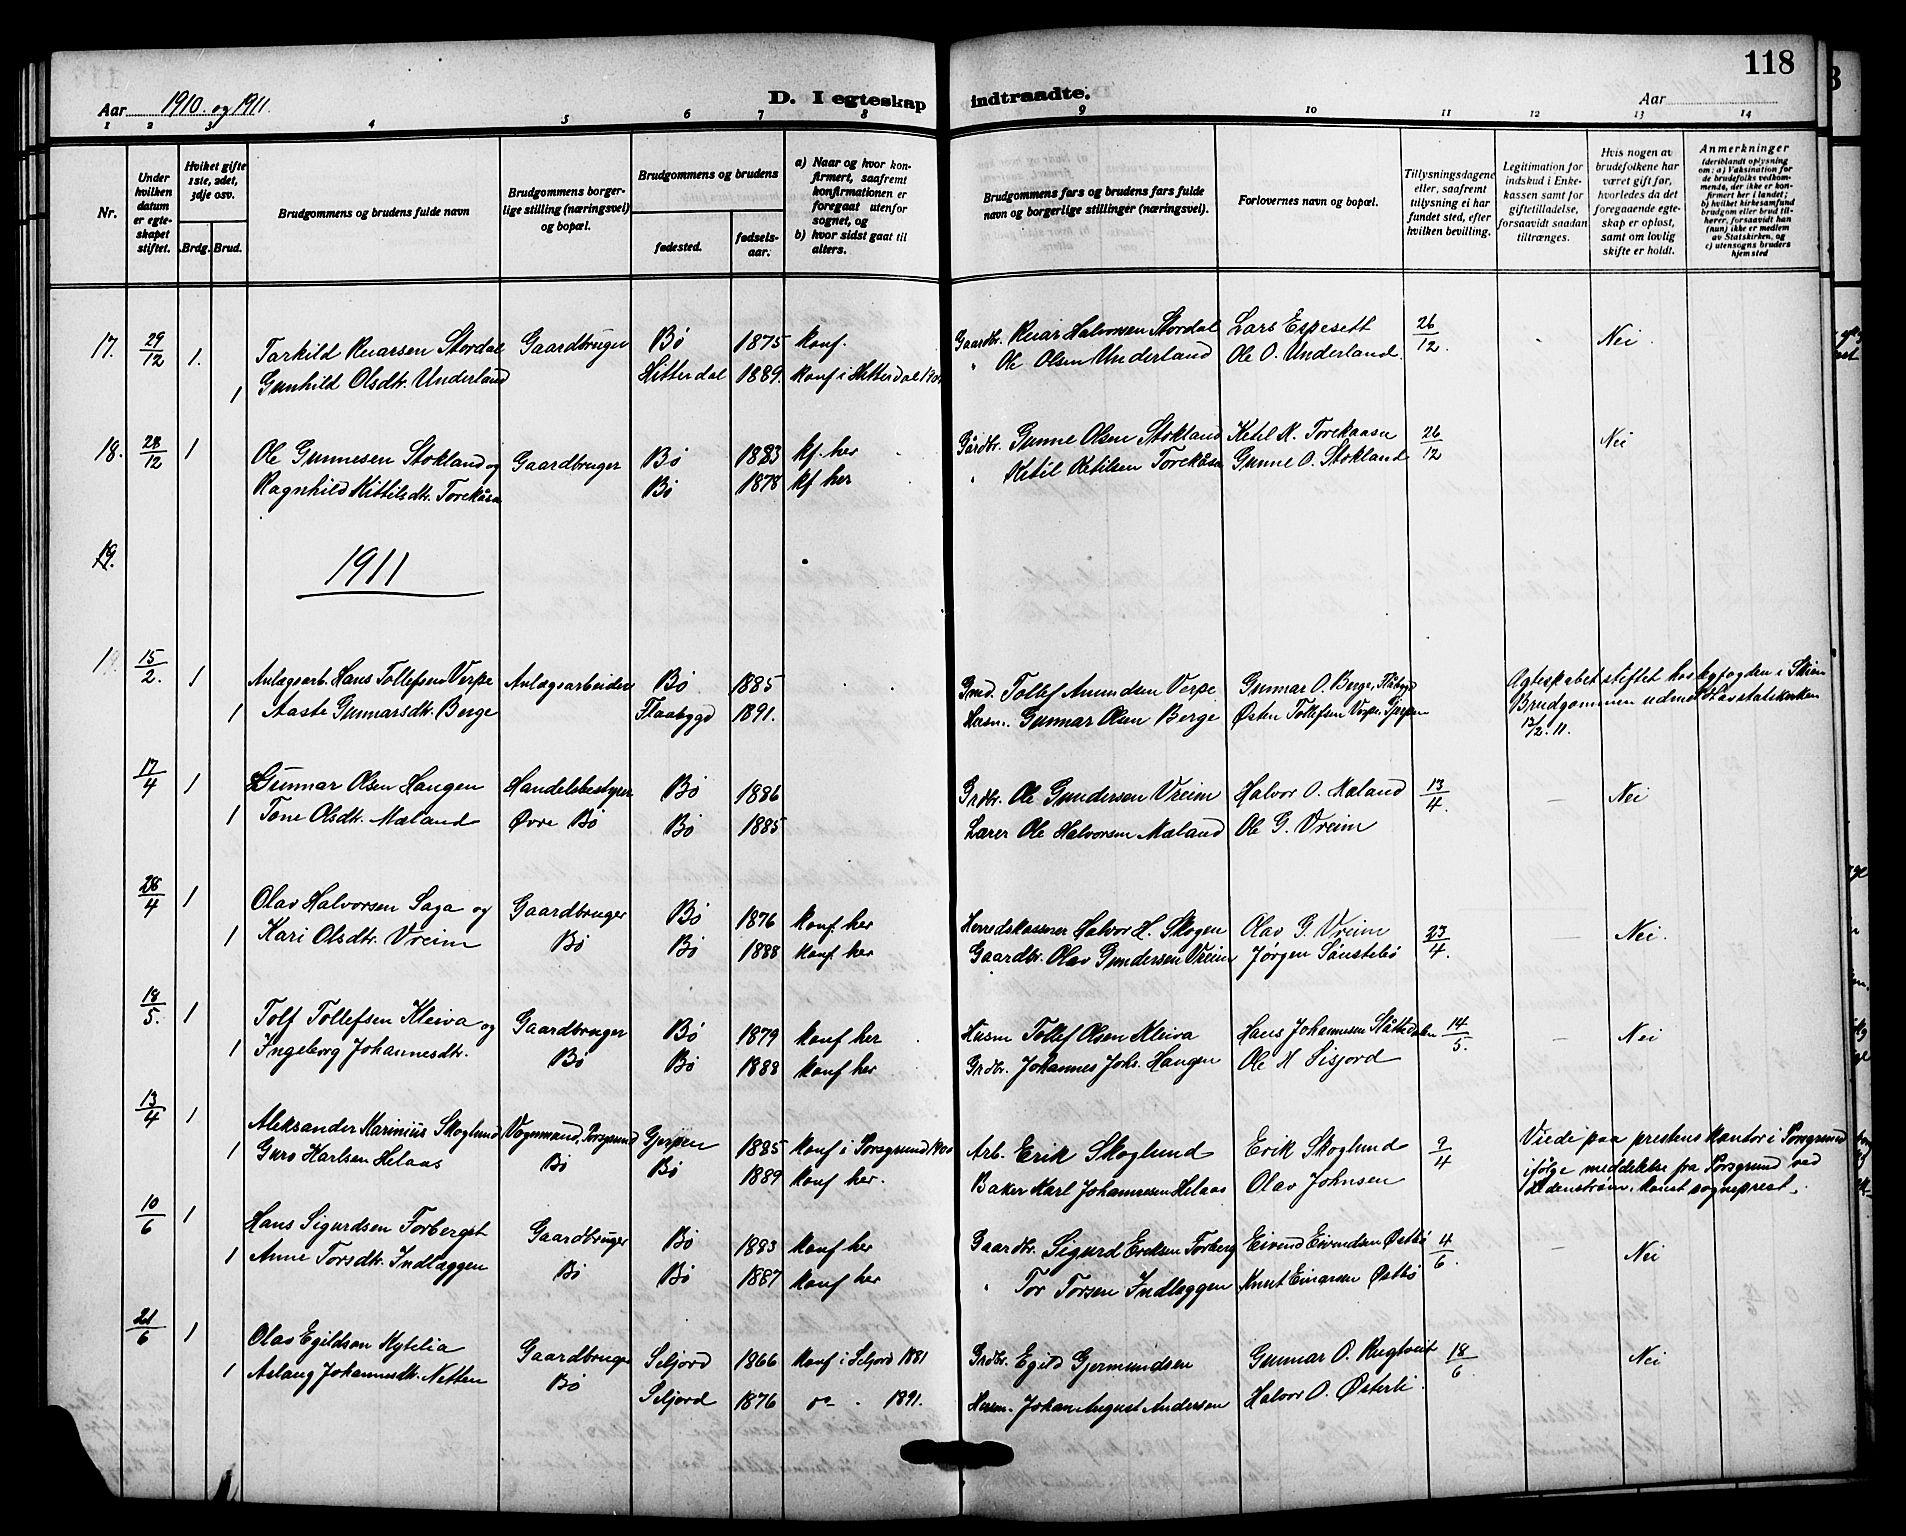 SAKO, Bø kirkebøker, G/Ga/L0007: Klokkerbok nr. 7, 1909-1924, s. 118